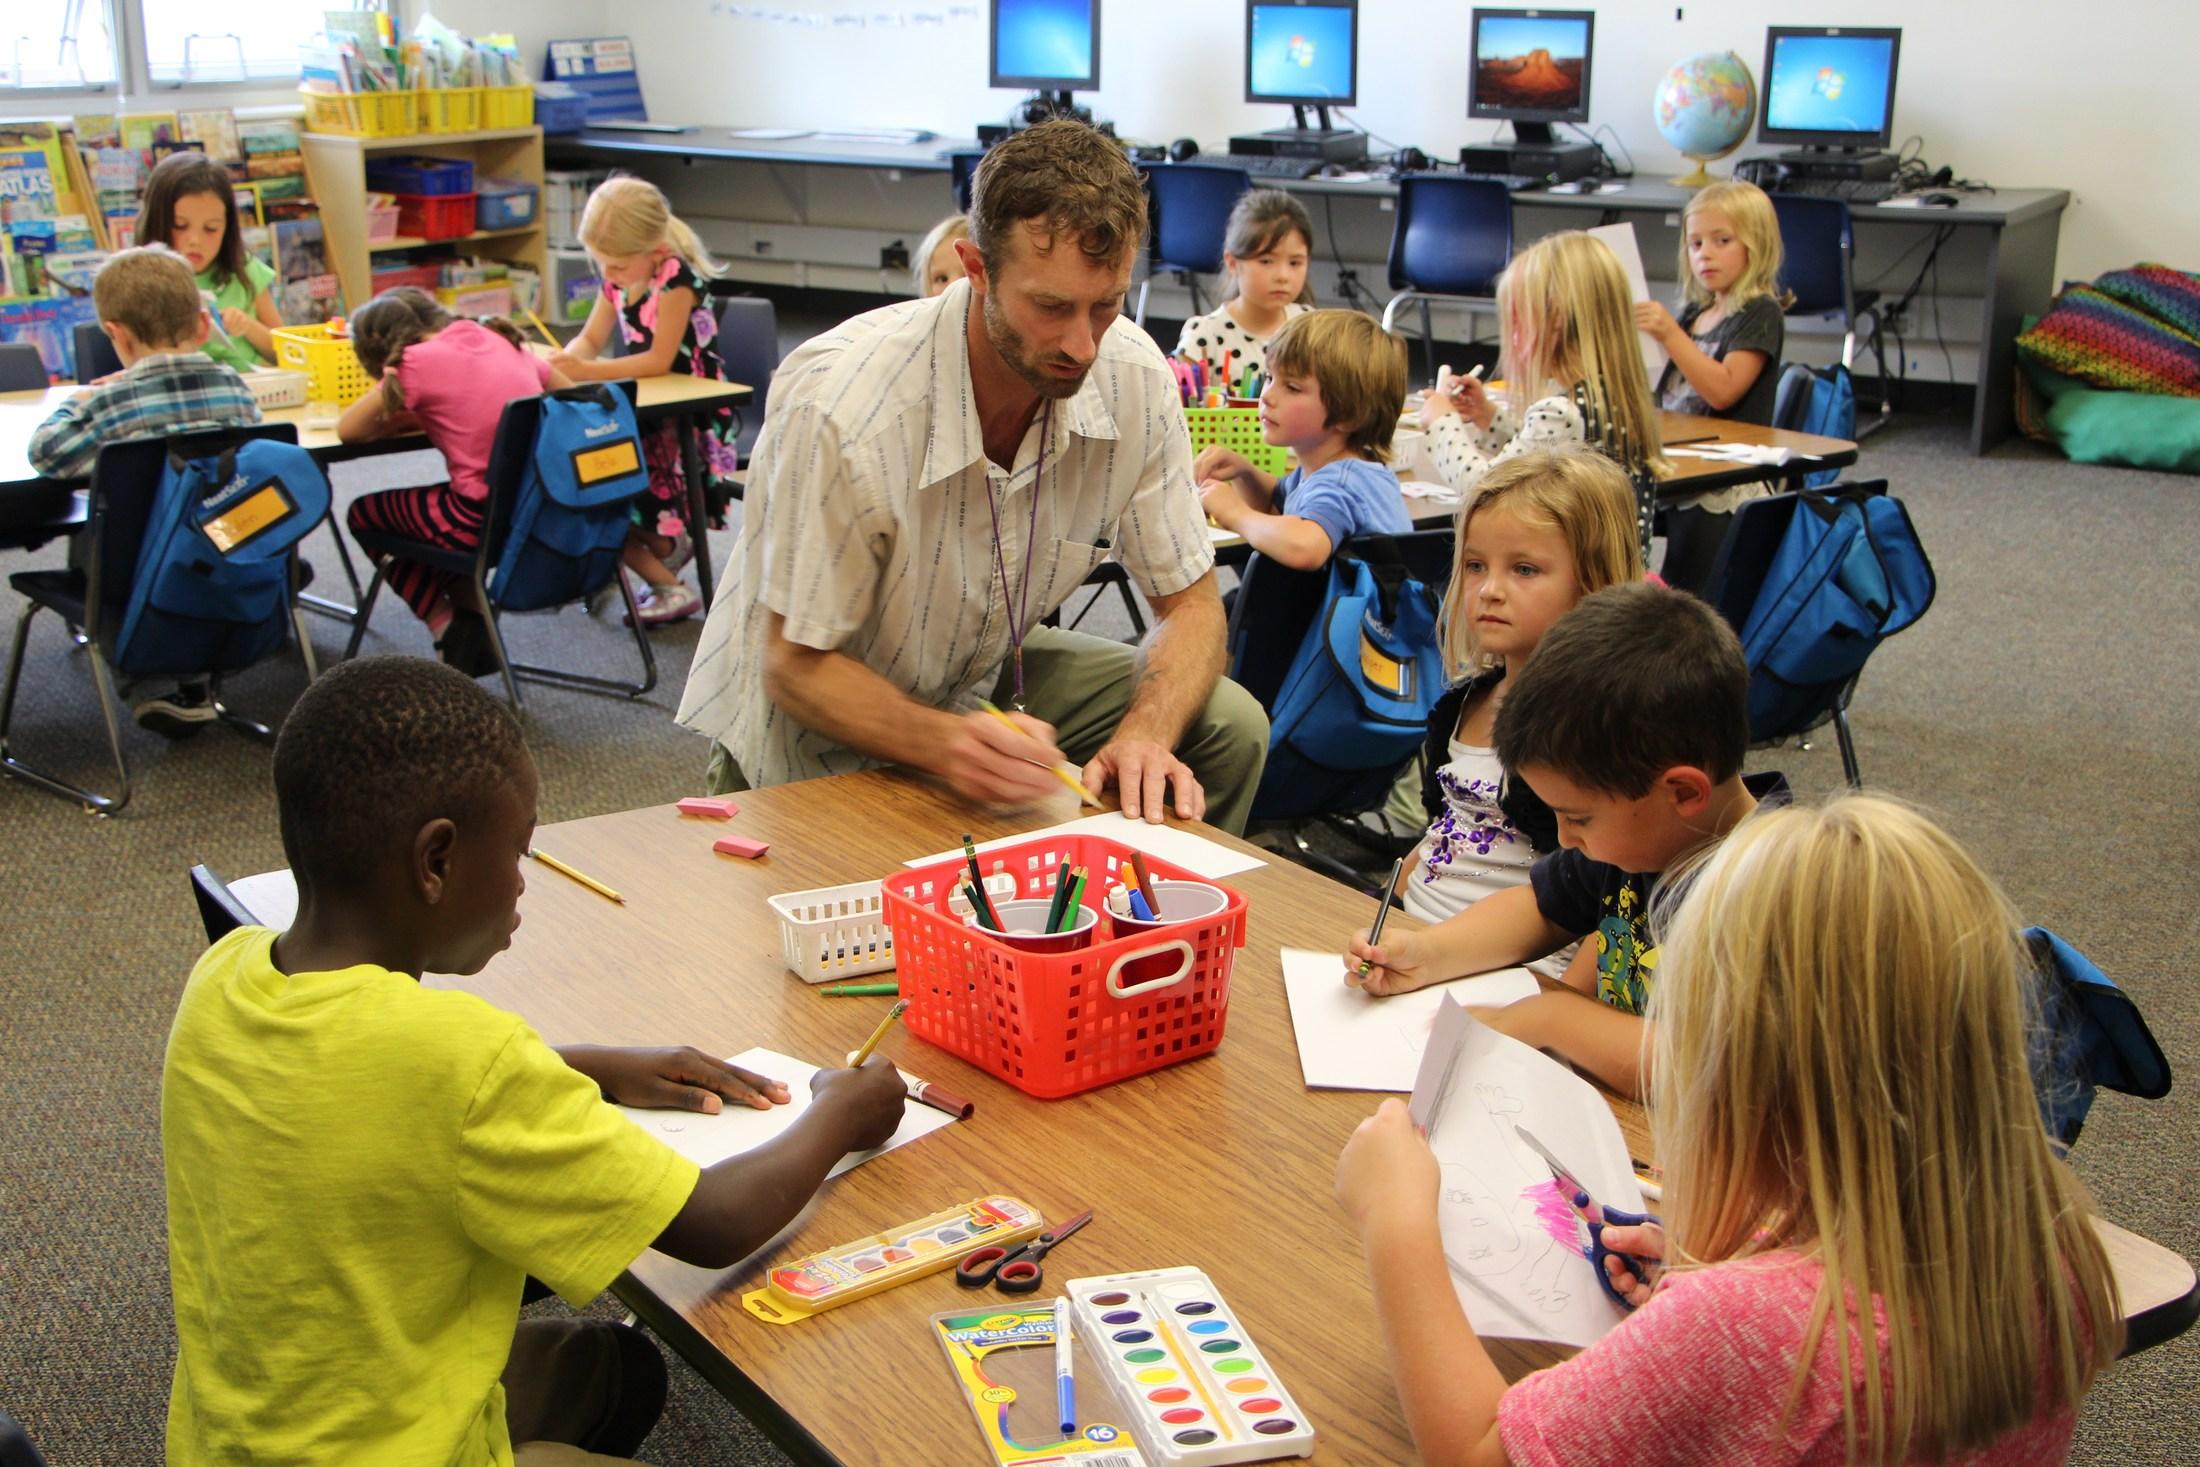 1st grade teacher Matt Ogburn works with students in his class.